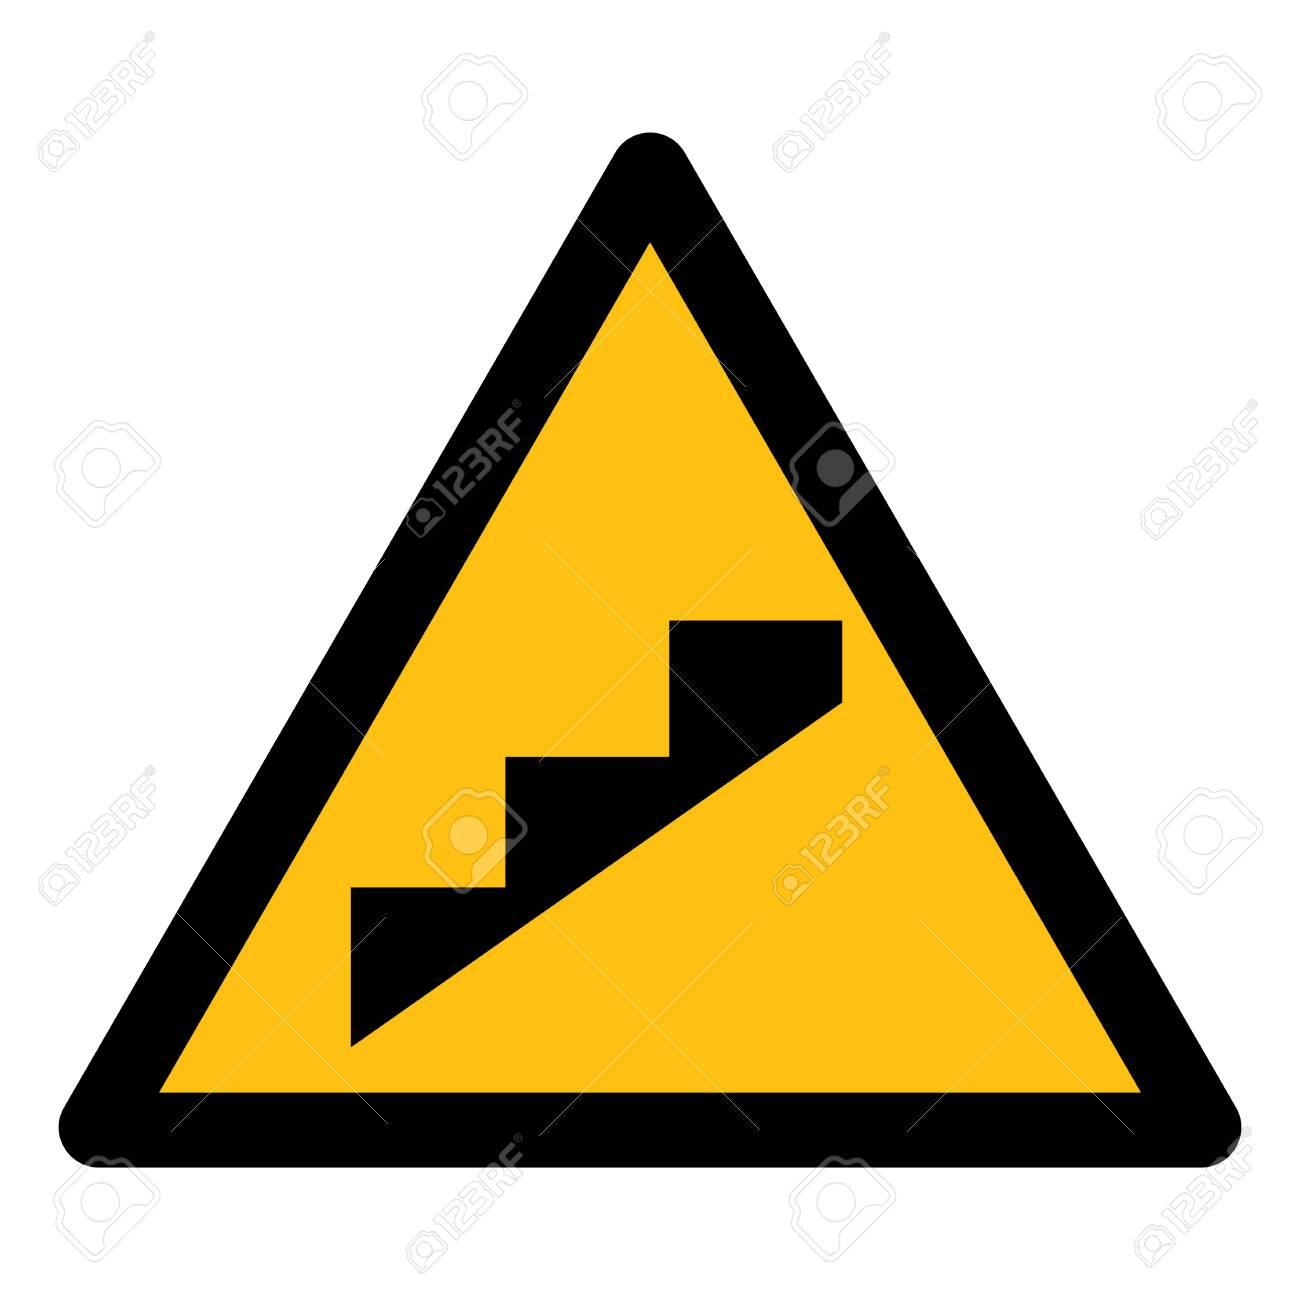 Beware Slope Step Symbol Isolate On White Background,Vector Illustration - 126053343